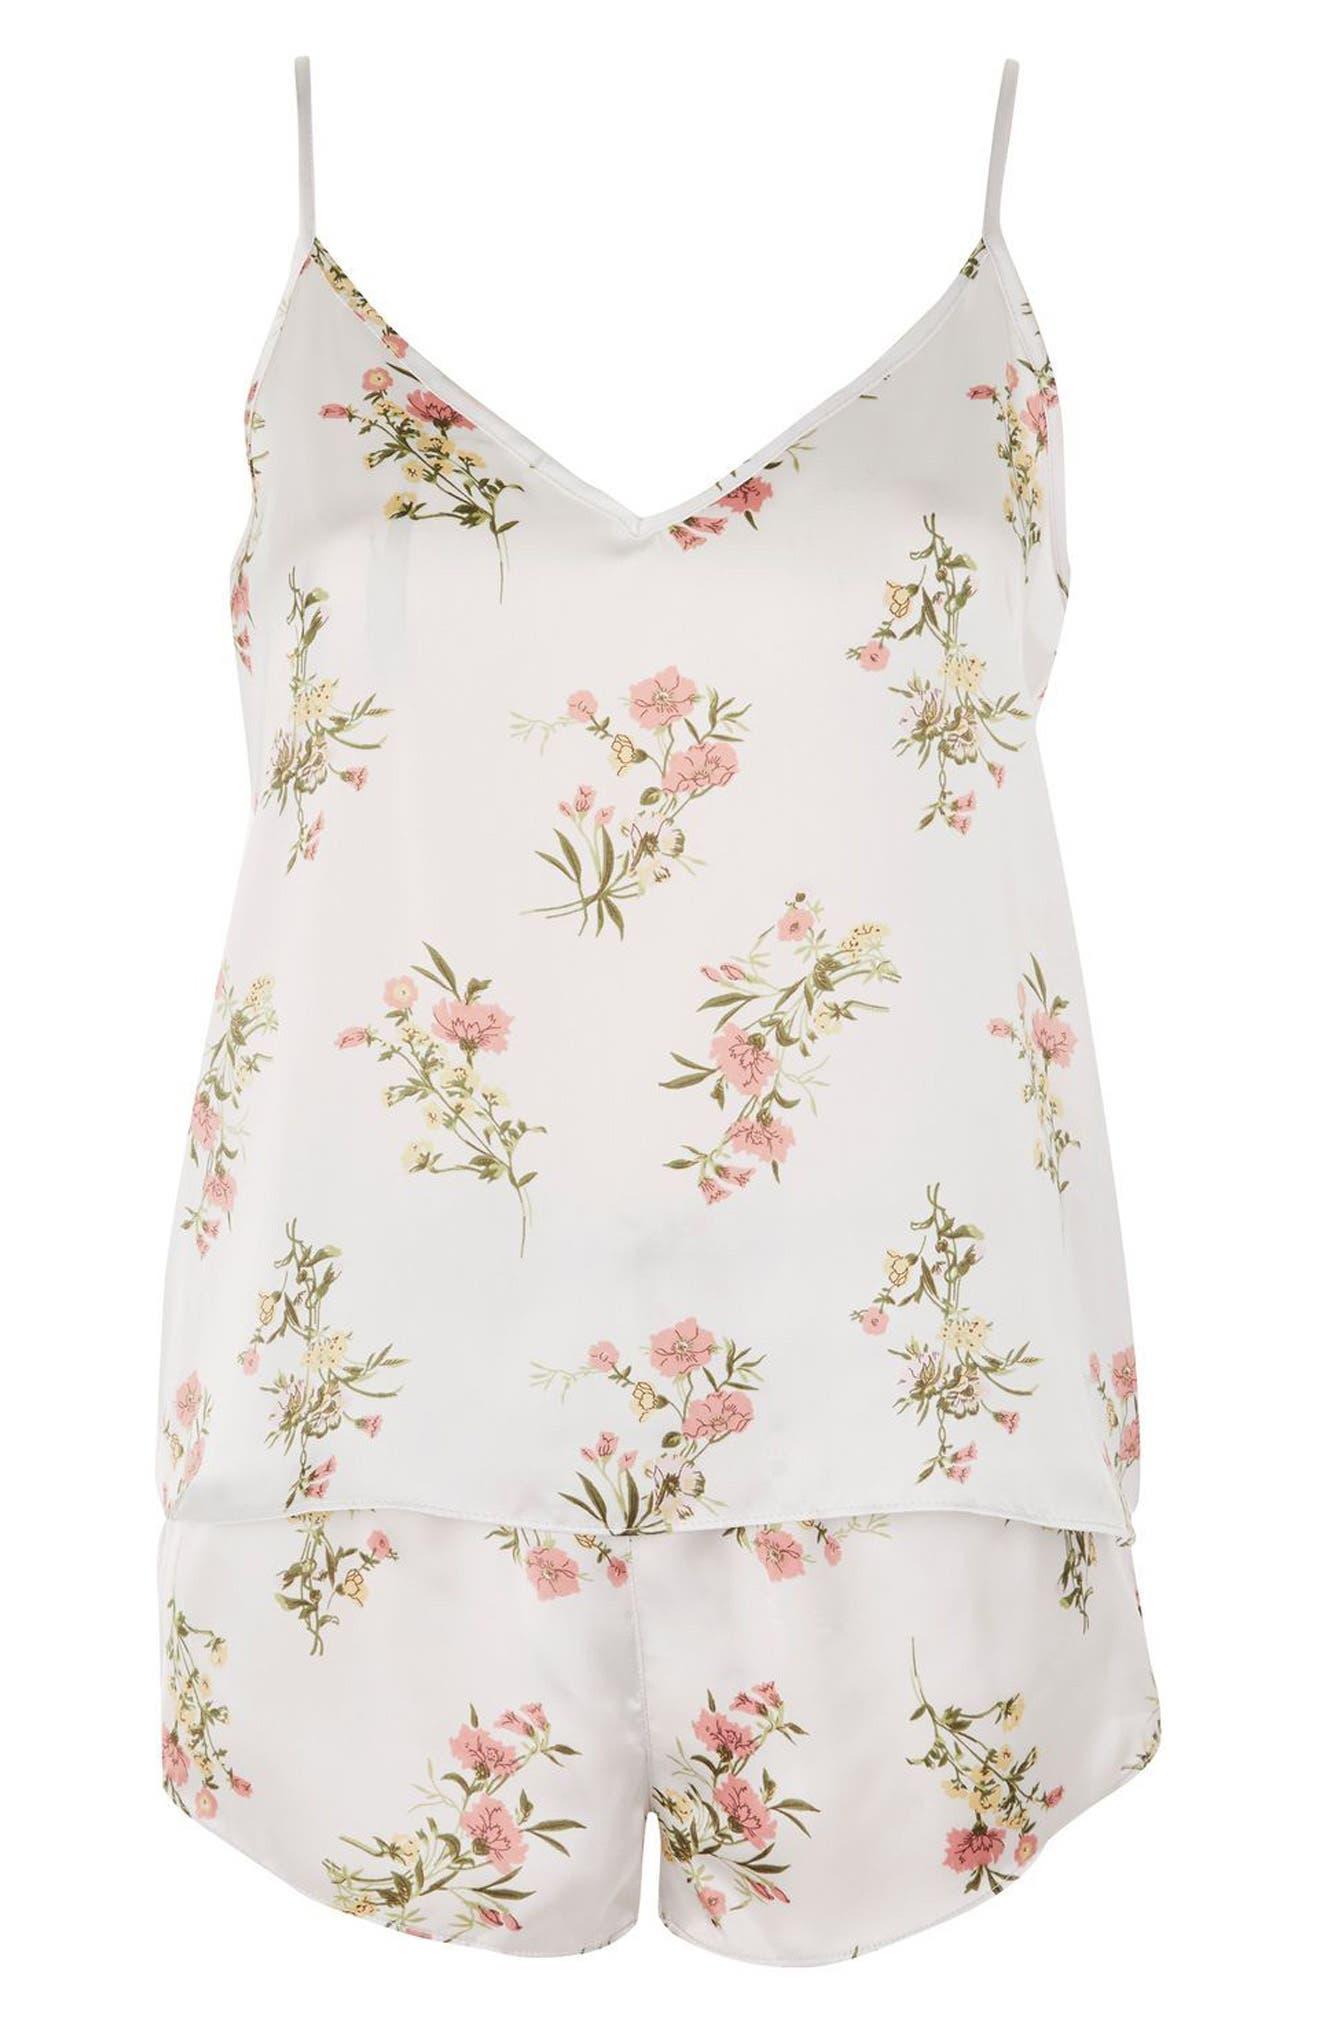 Garden Flower Camisole & Short Pajamas,                             Alternate thumbnail 4, color,                             Ivory Mutli